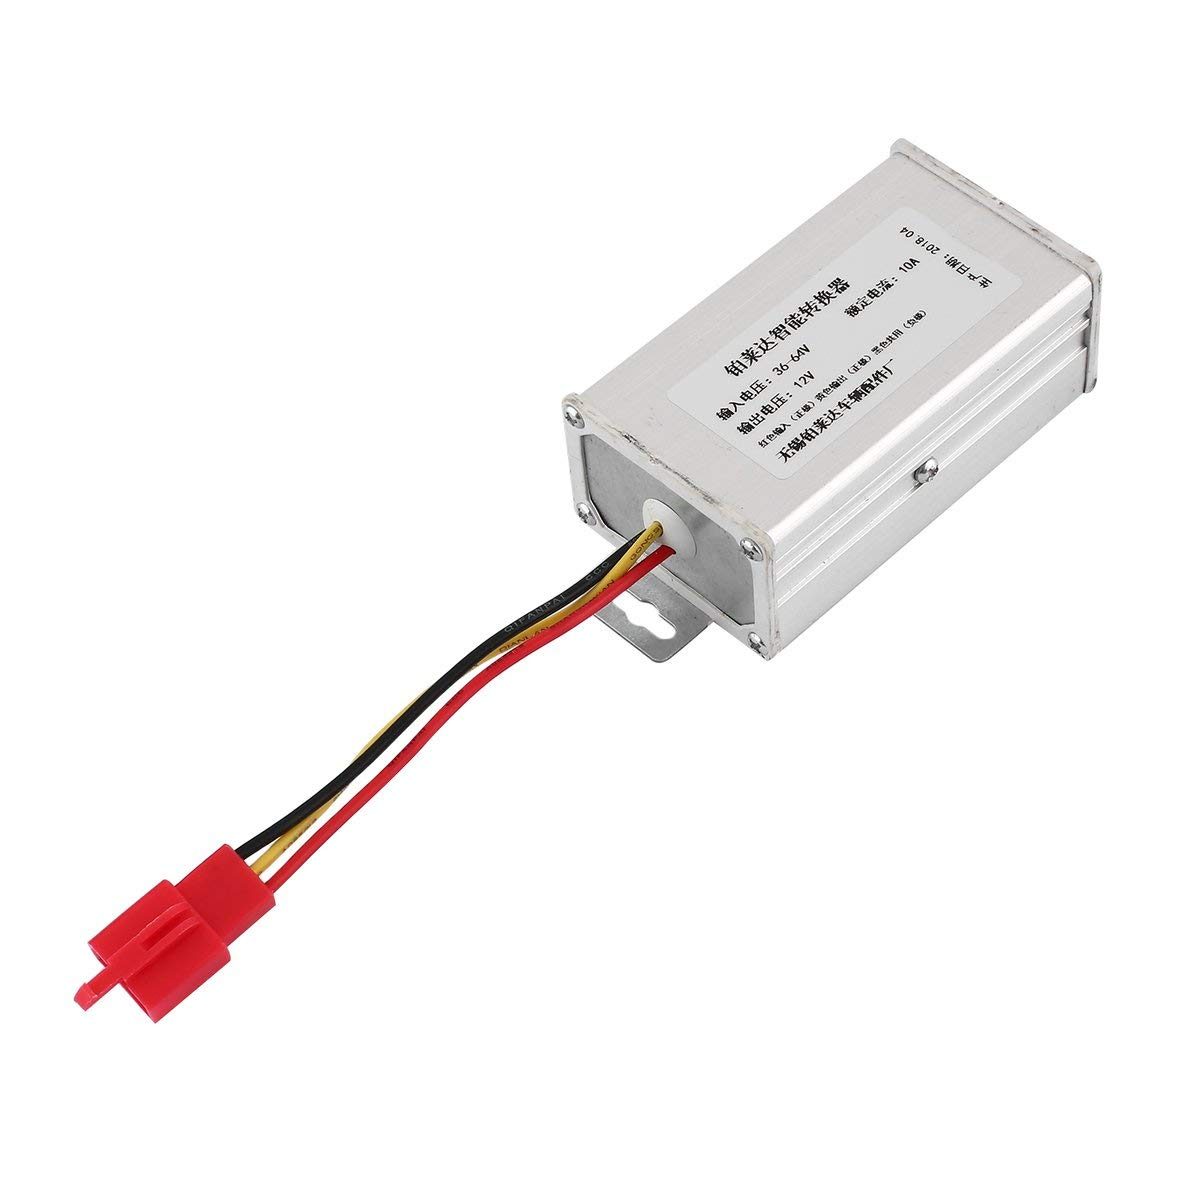 Electric Vehicle Transformer Intelligent DC Converter Adapter 48V To 12V Gugutogo